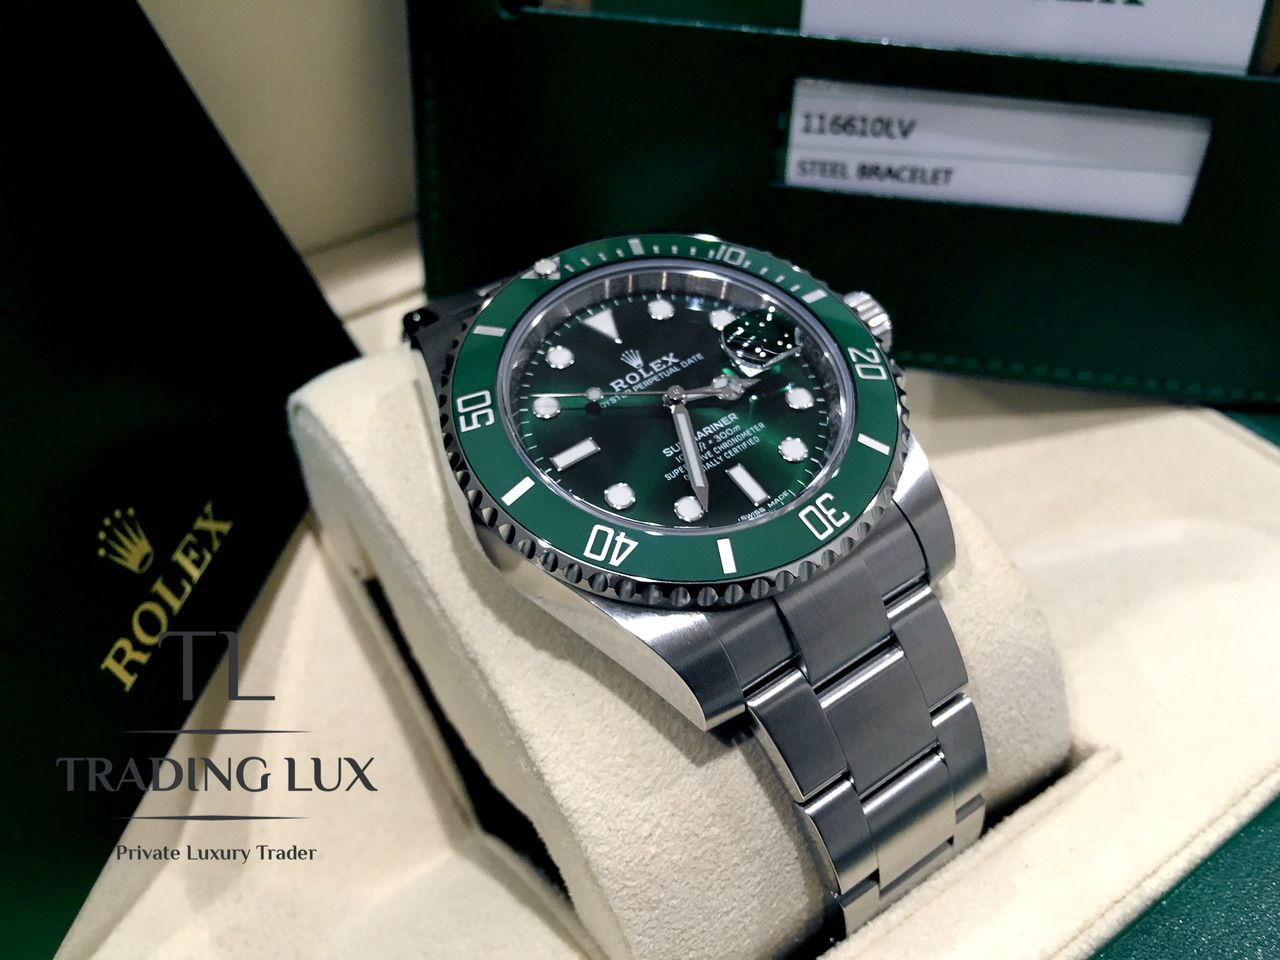 Rolex-116610LV-Hulk-5